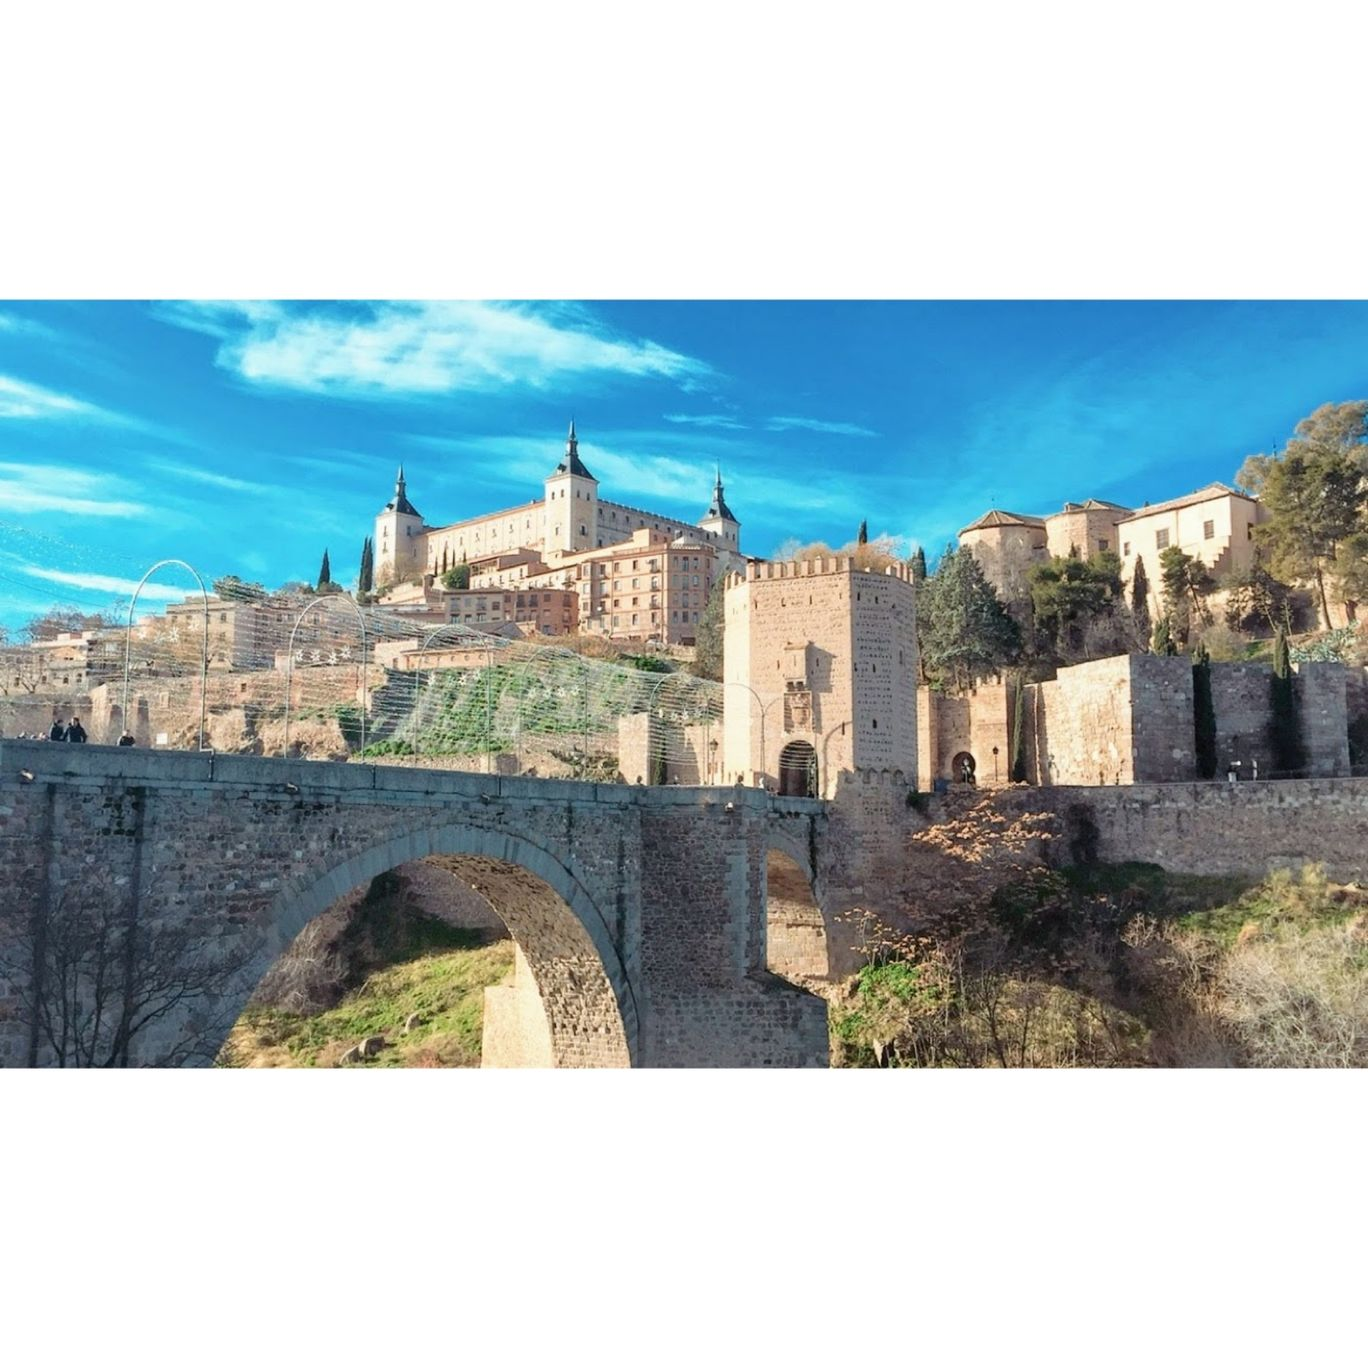 Photo of Toledo By Abhi Vora